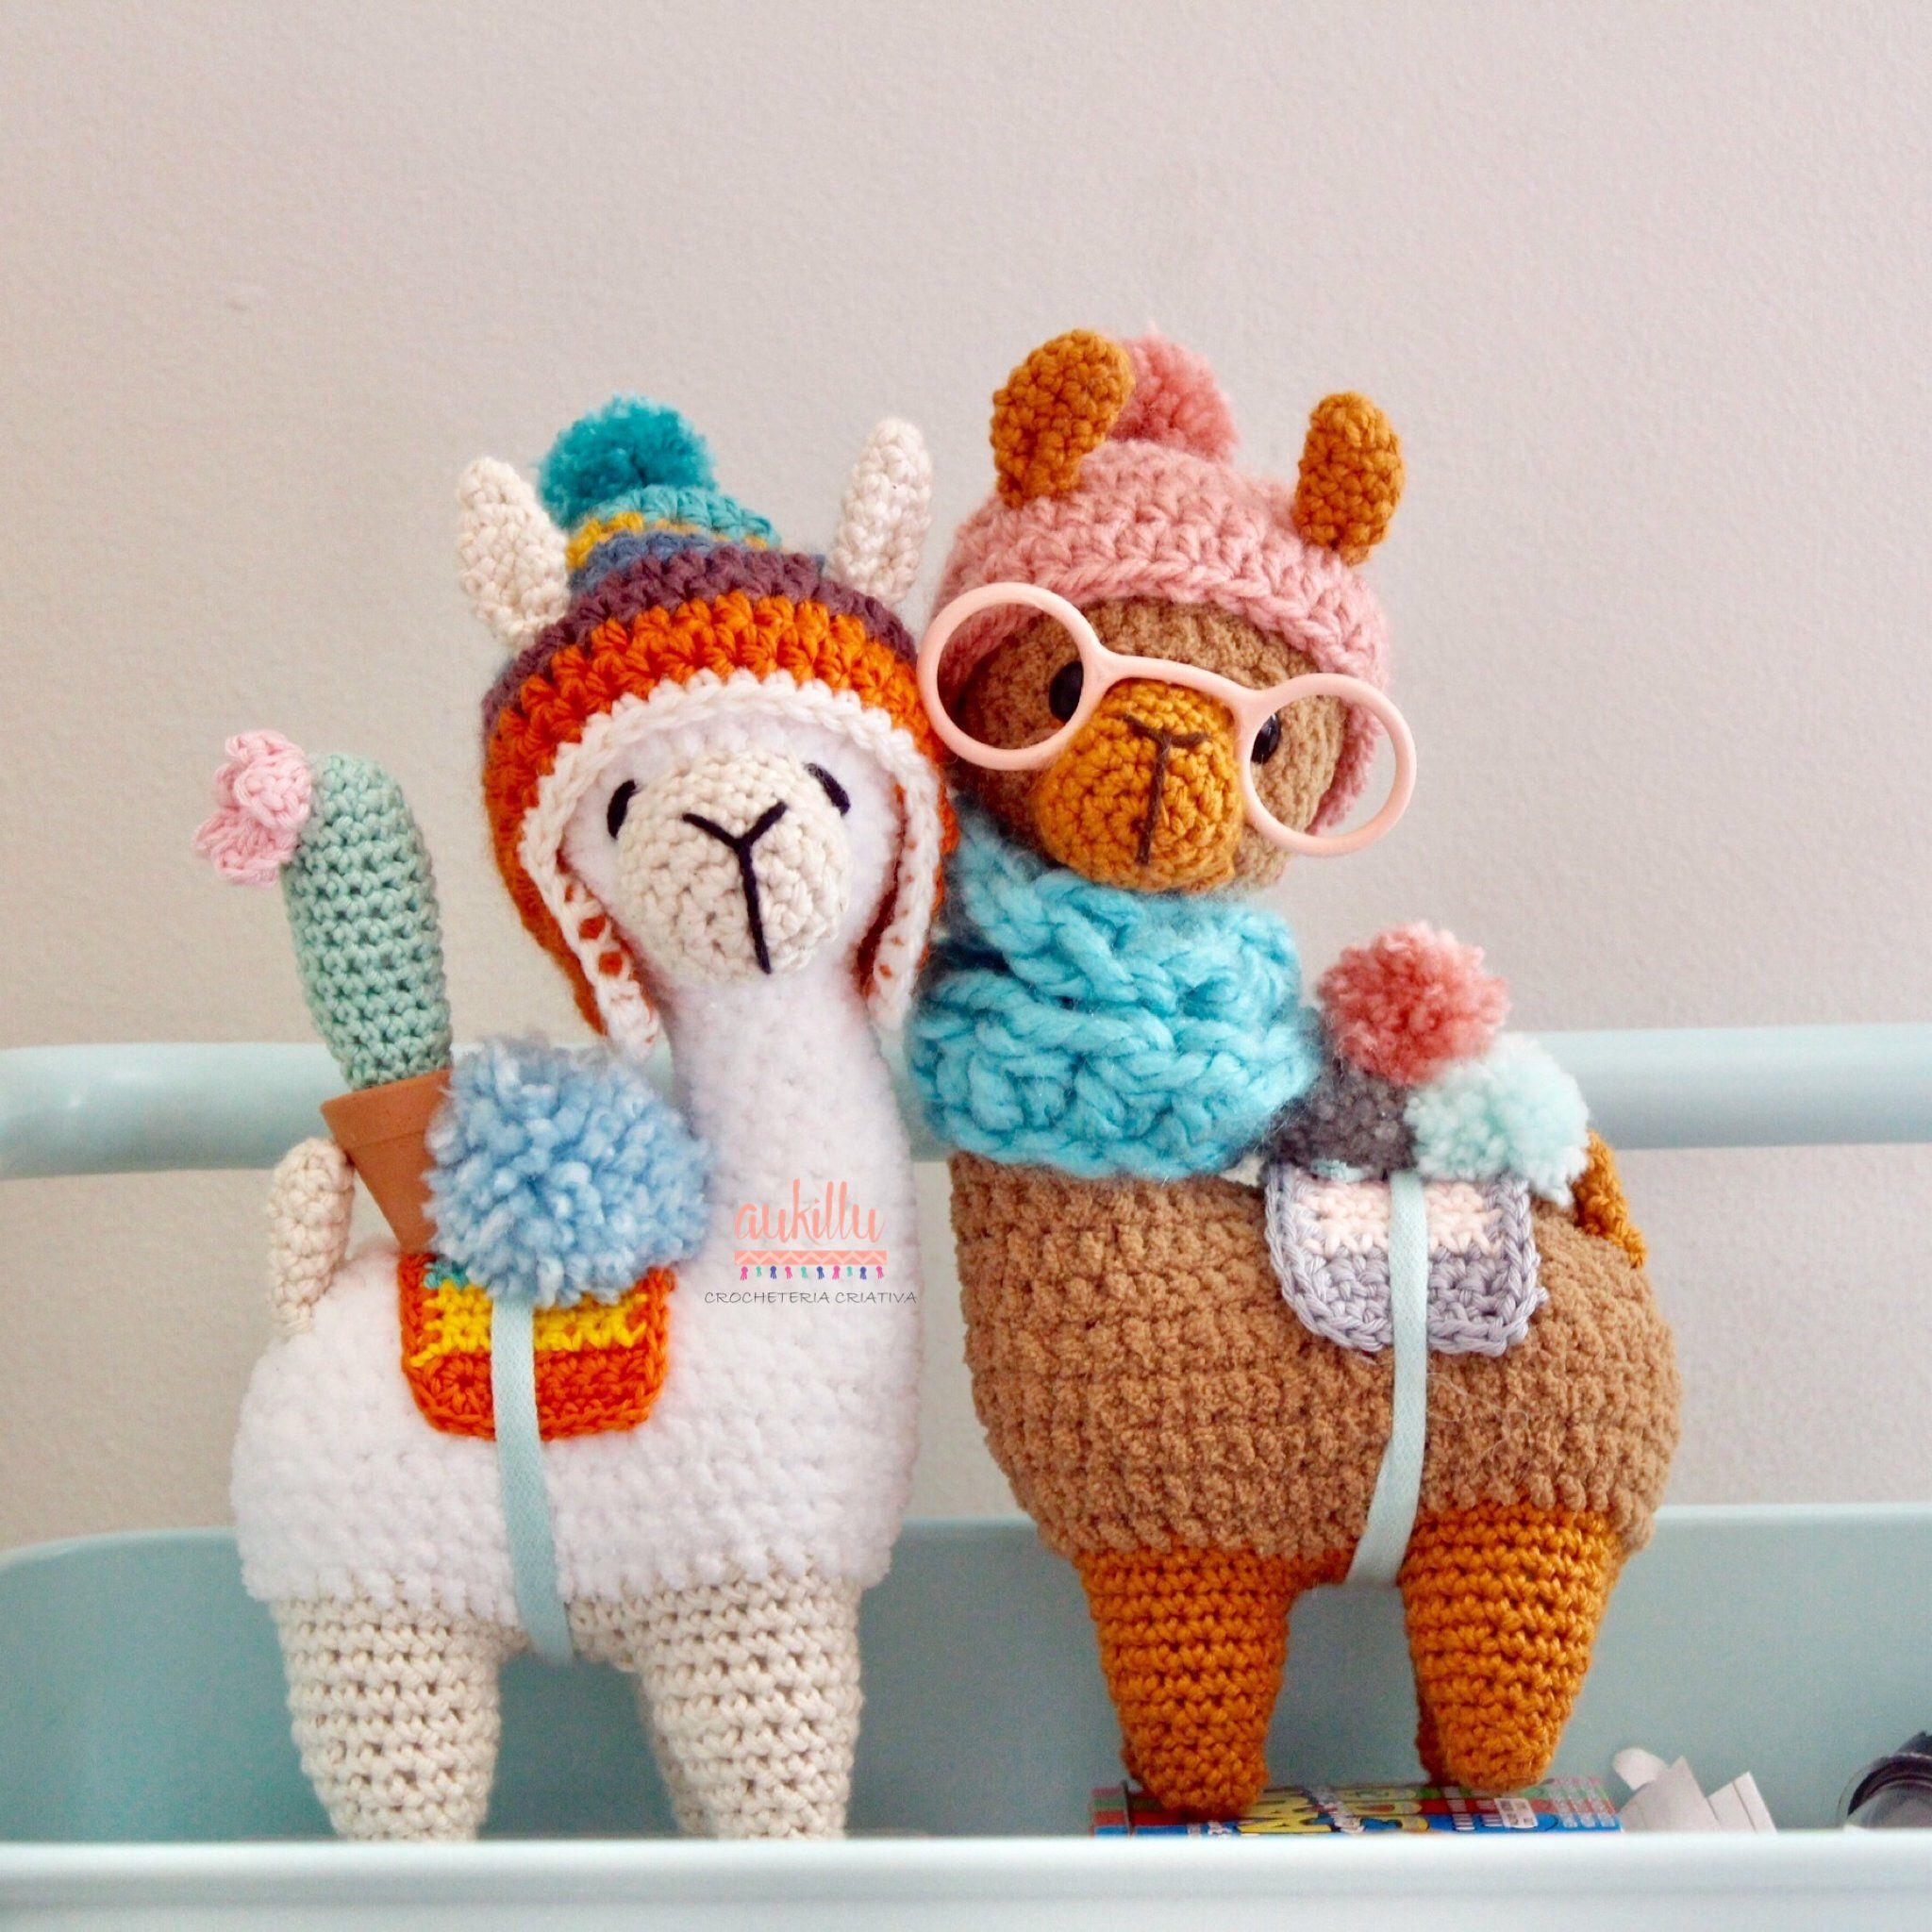 Llama de crochet   CrochetyAmigurumis.com   2048x2048